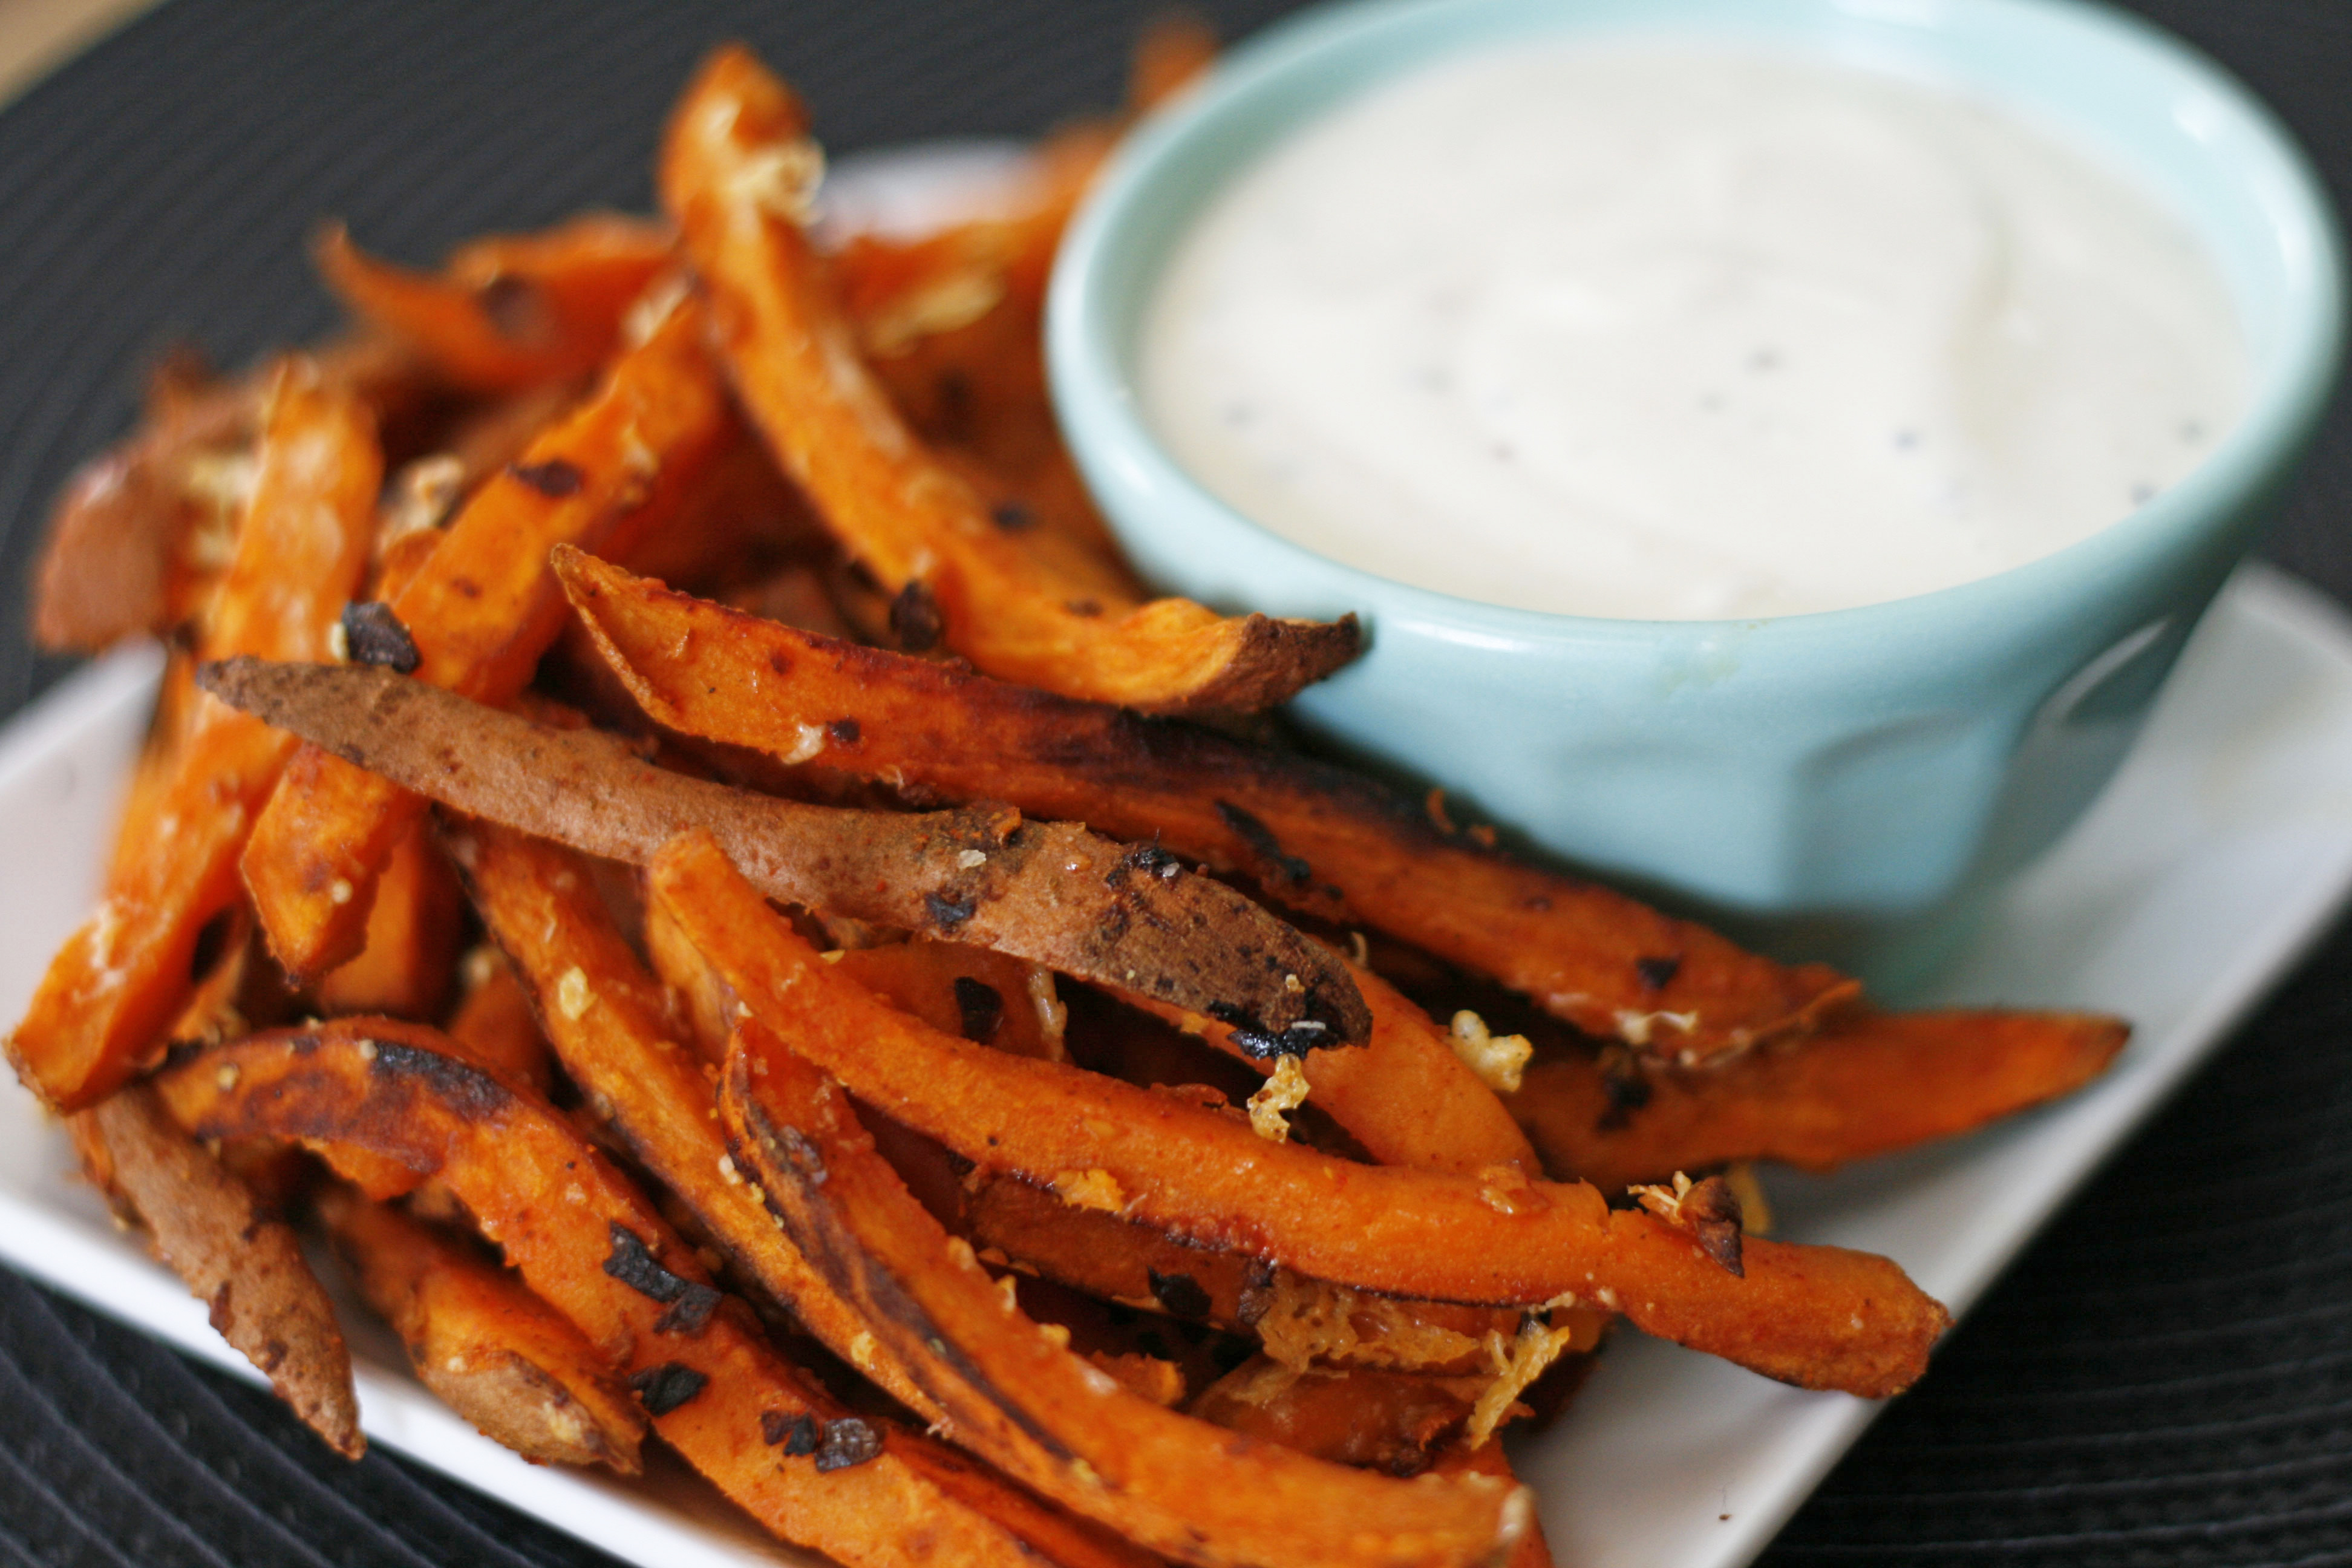 Sweet potato chips & serving sauce